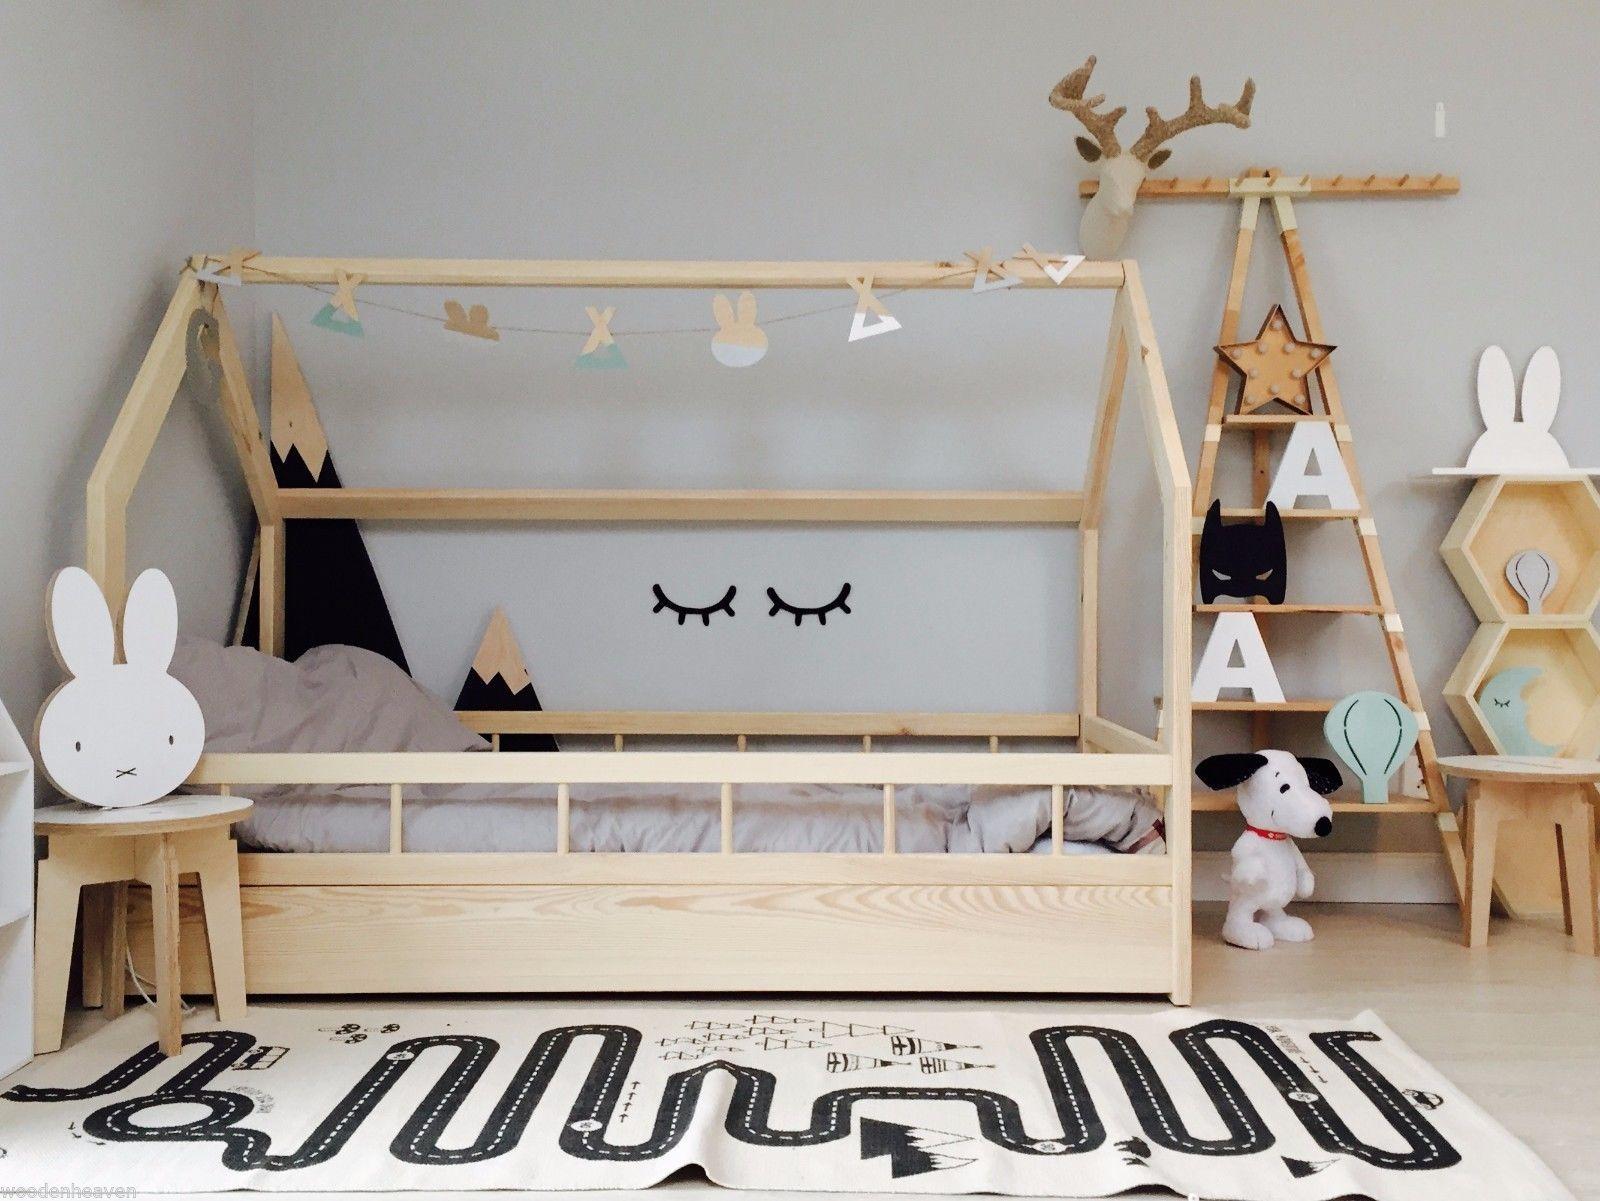 Hausbett Kinderhaus Farbe Sicherheitbarieren House Bed Kinder Bett